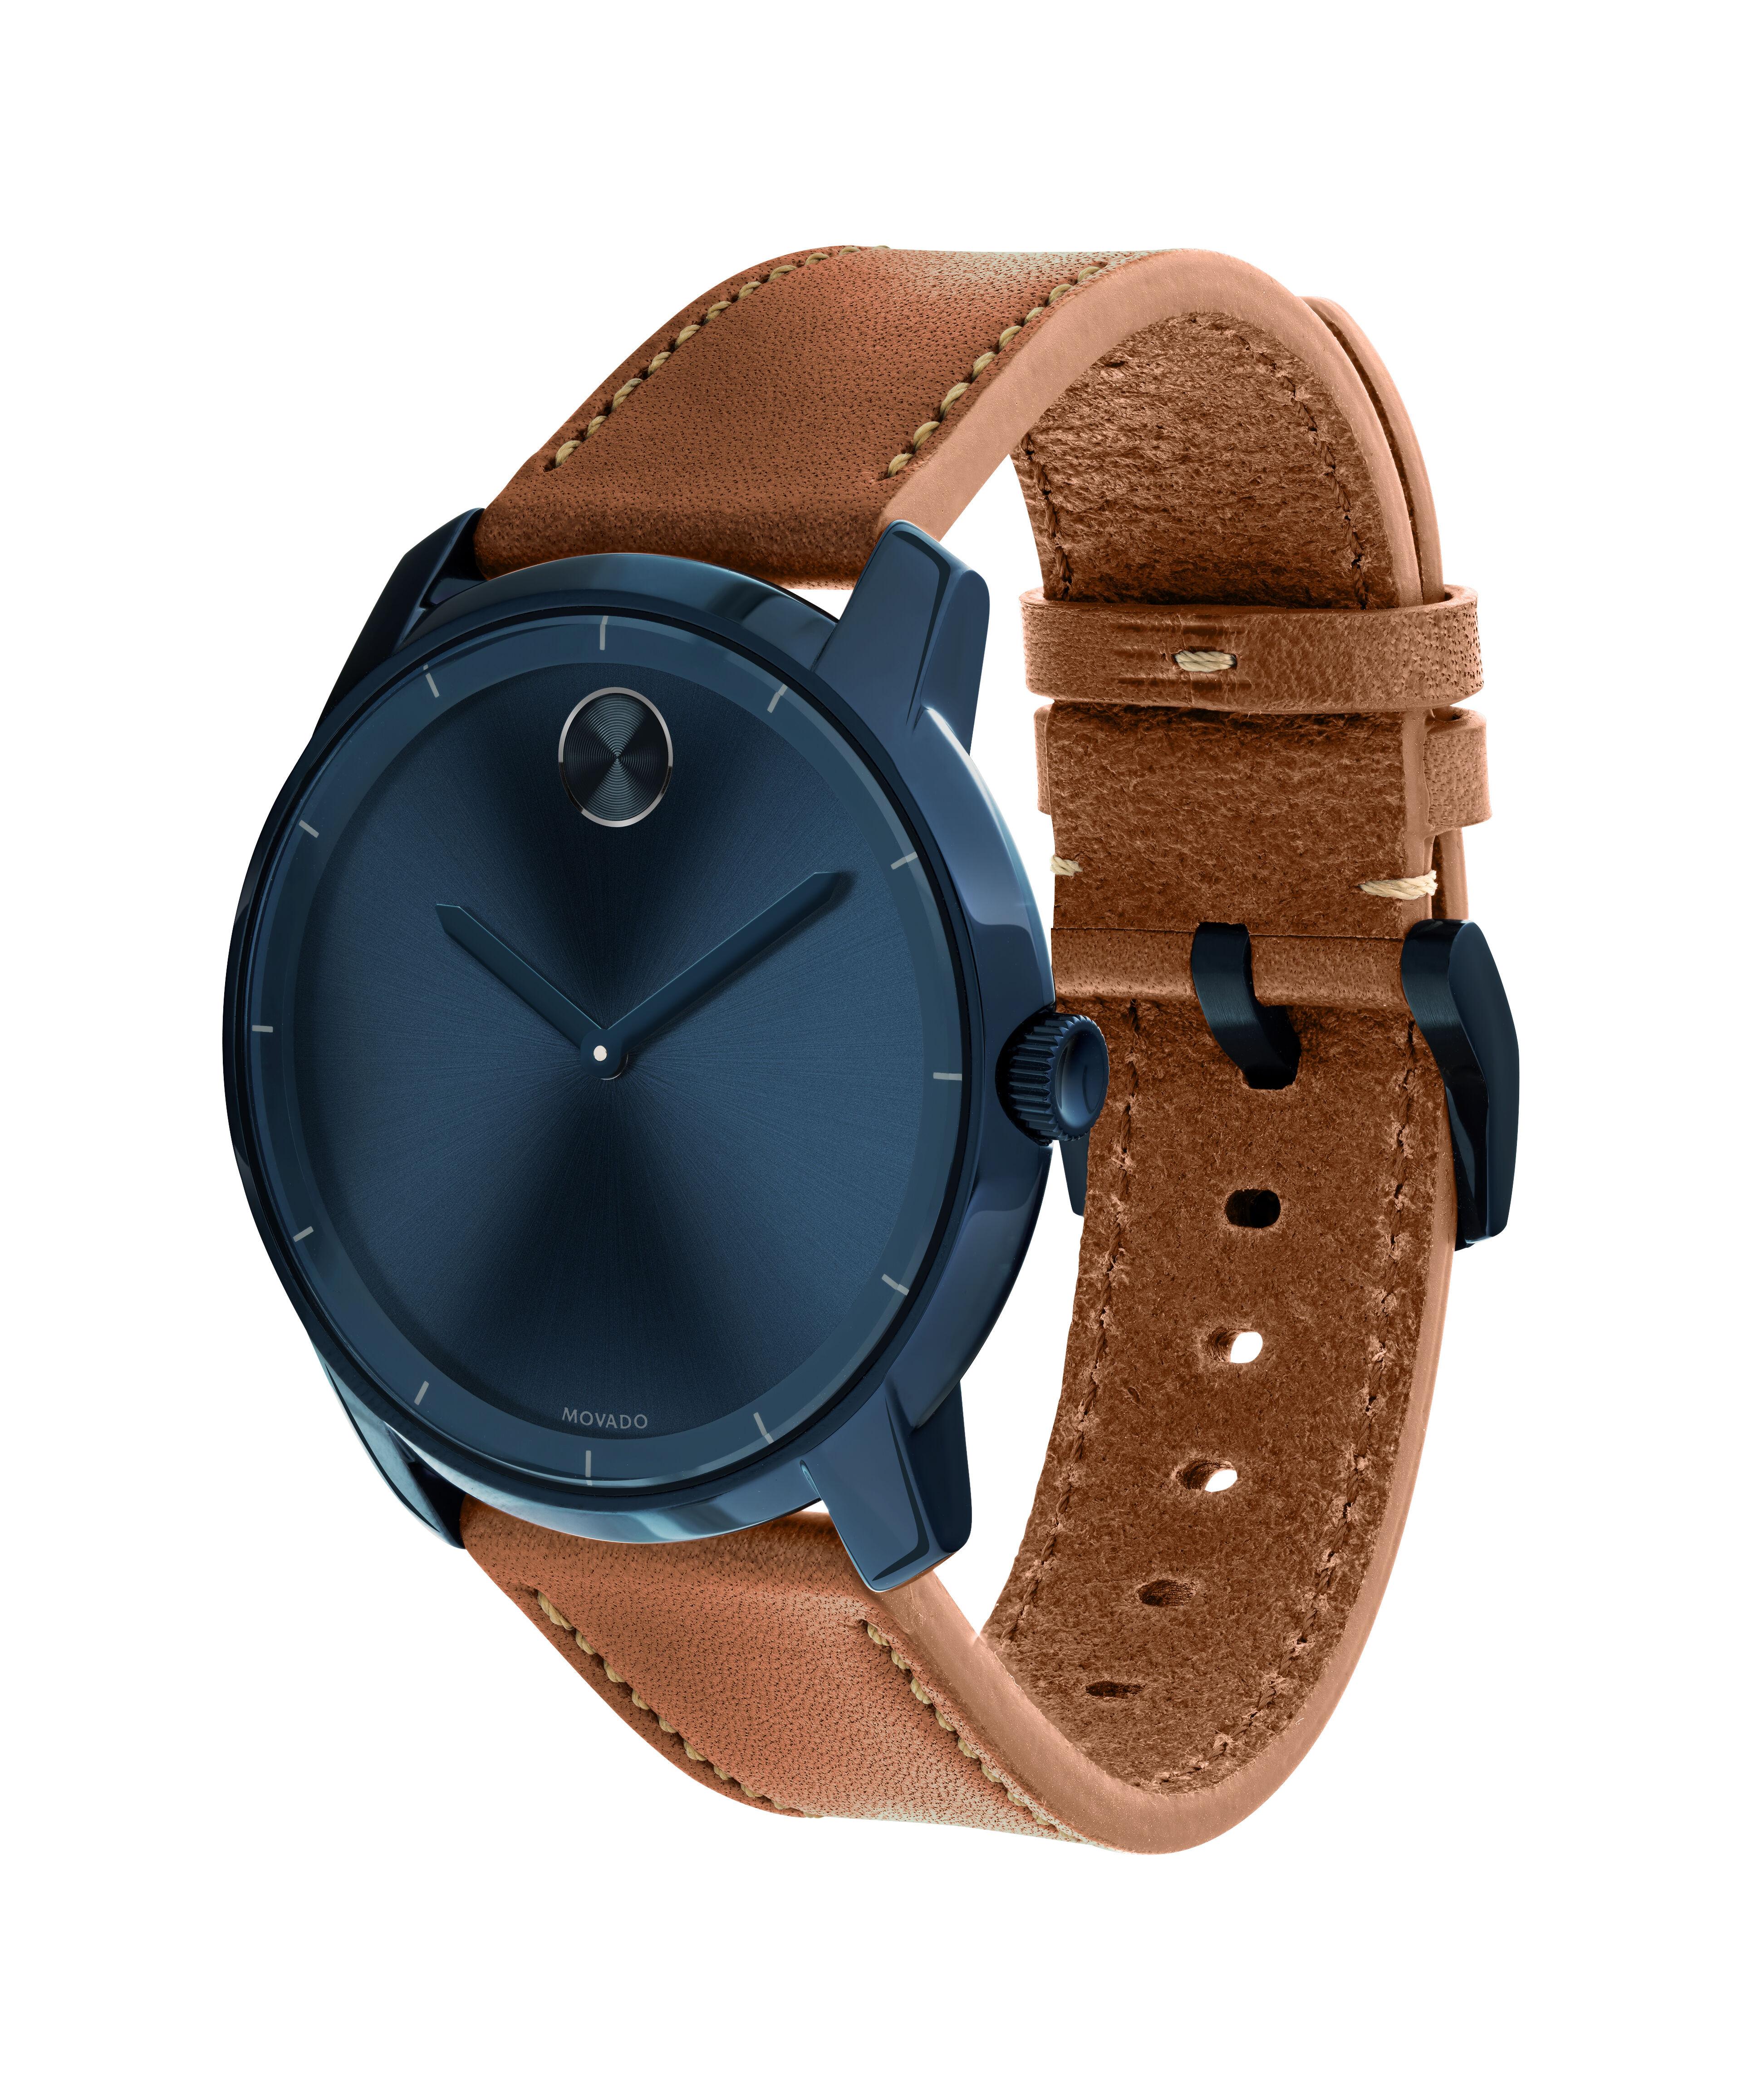 The Watch Snob Replicas